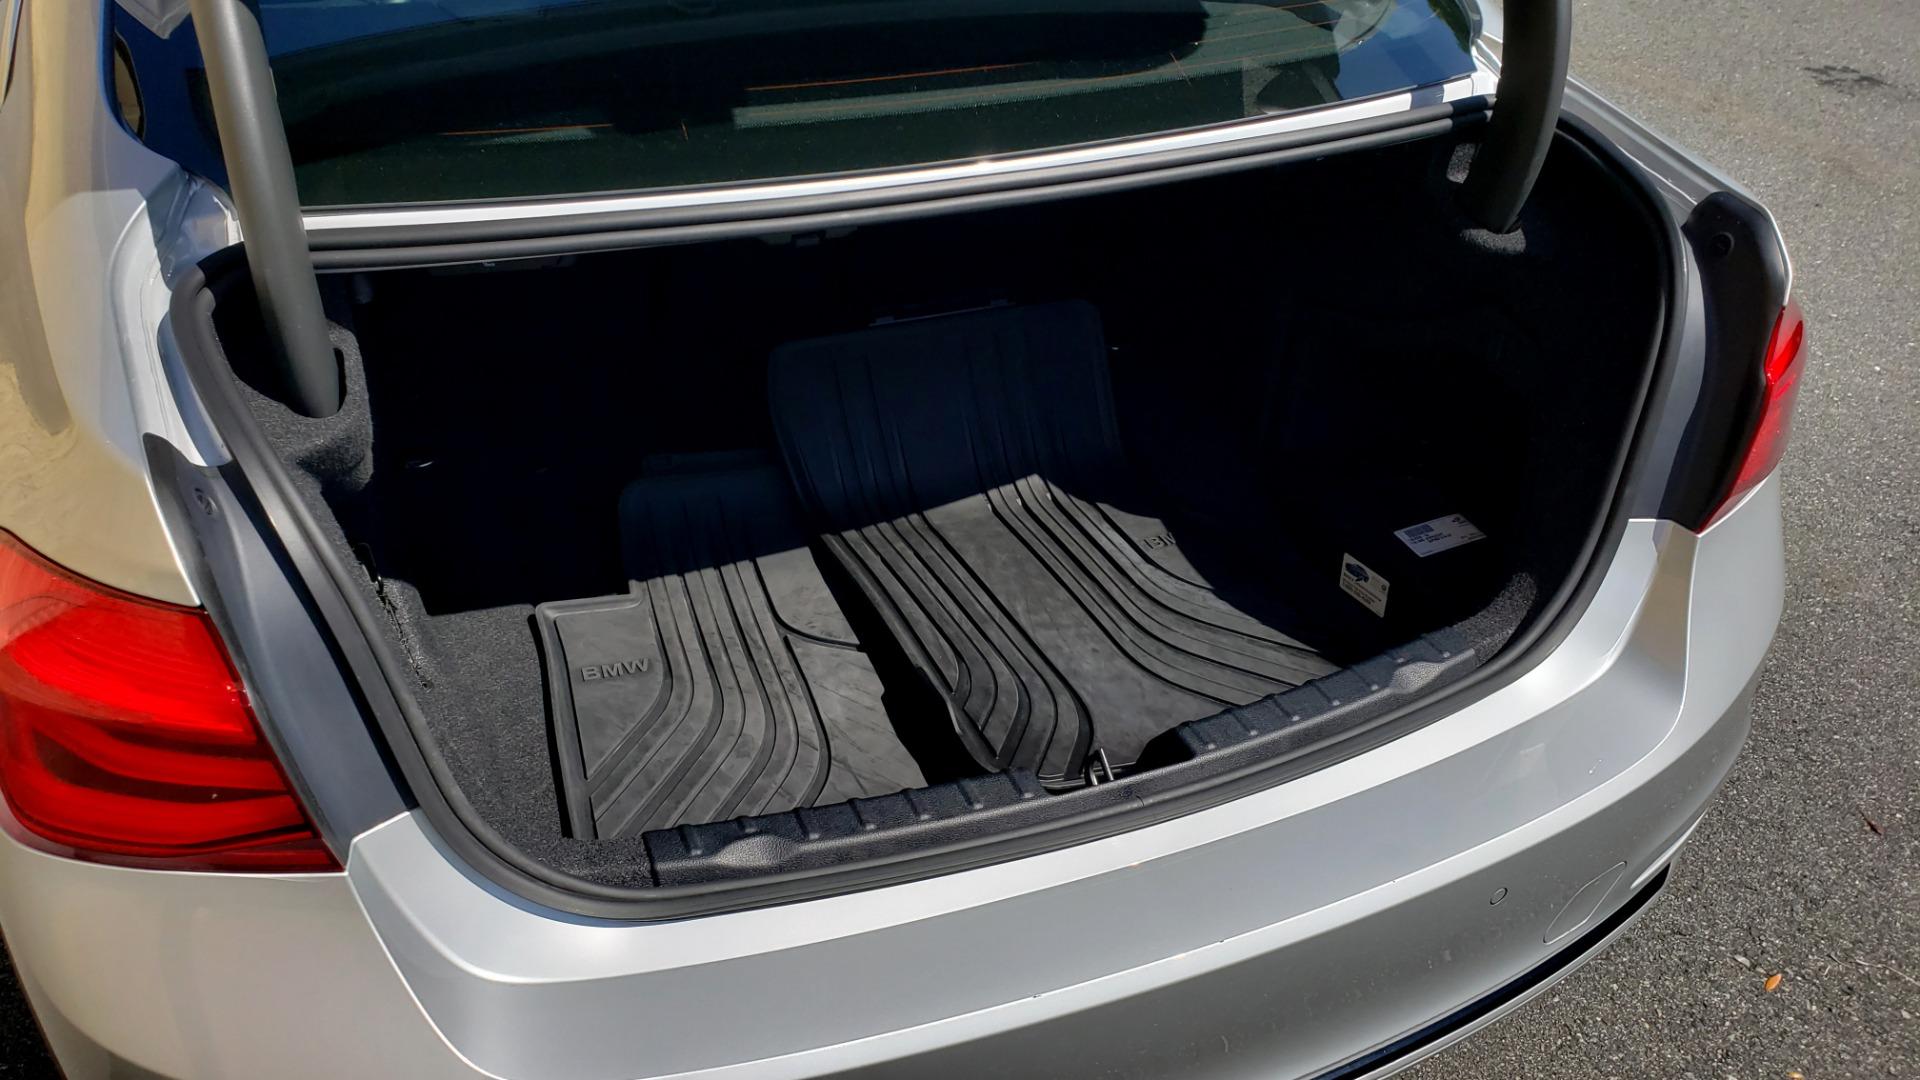 Used 2017 BMW 3 SERIES 330I SPORT SEDAN / DRVR ASST PKG / SUNROOF / REARVIEW for sale Sold at Formula Imports in Charlotte NC 28227 13